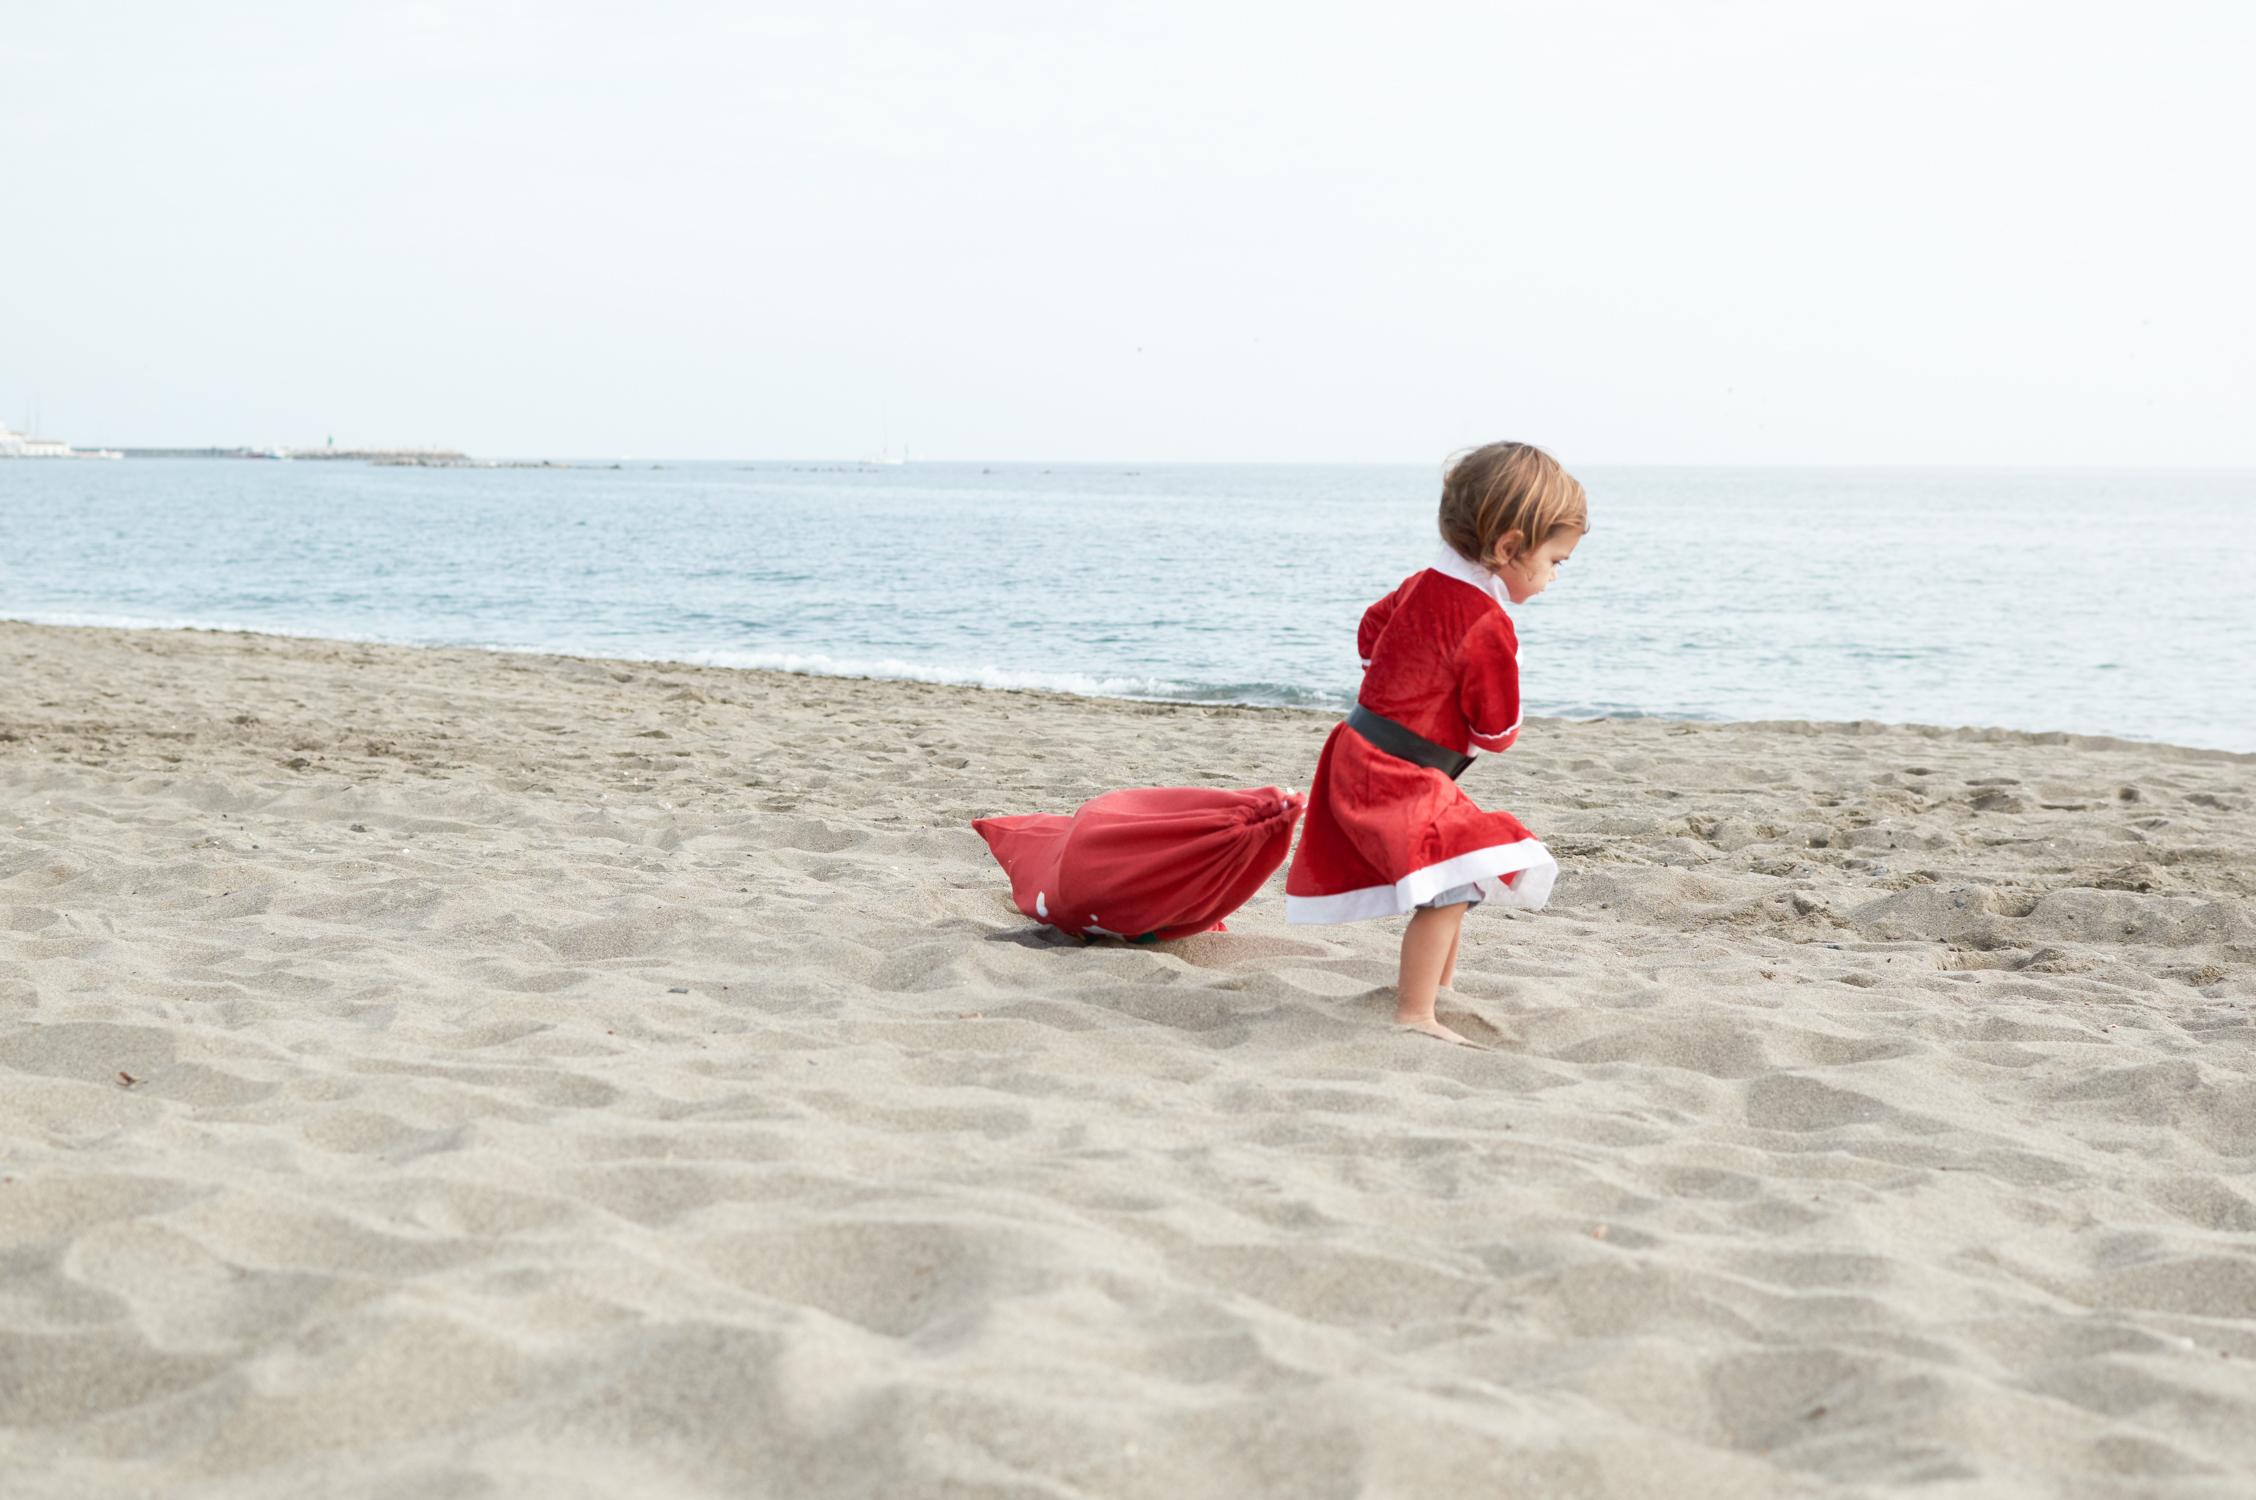 Child_photography_ideas-7